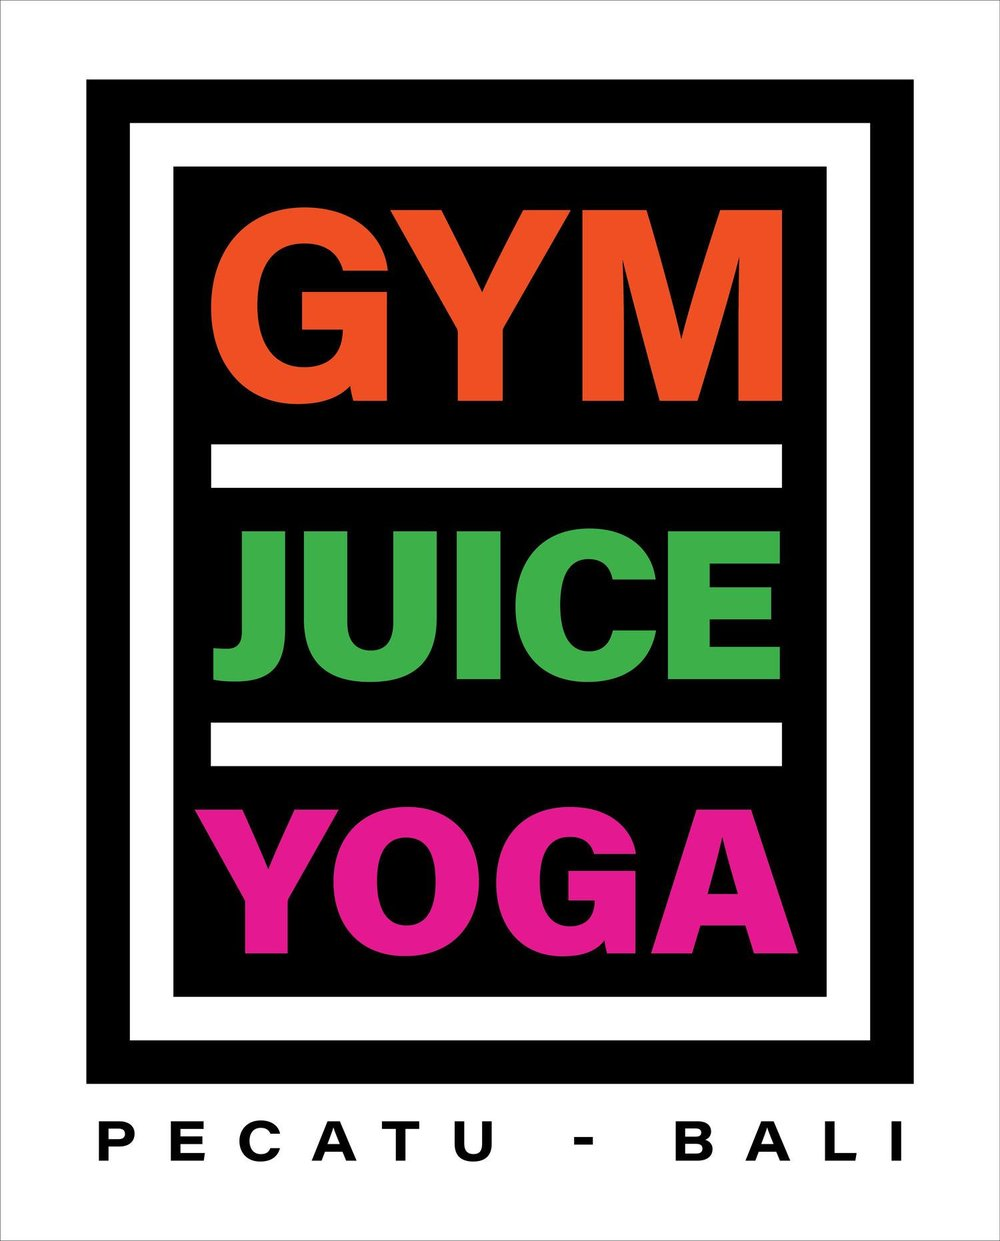 GYM-JUICE-YOGA-Logo-Color.jpg